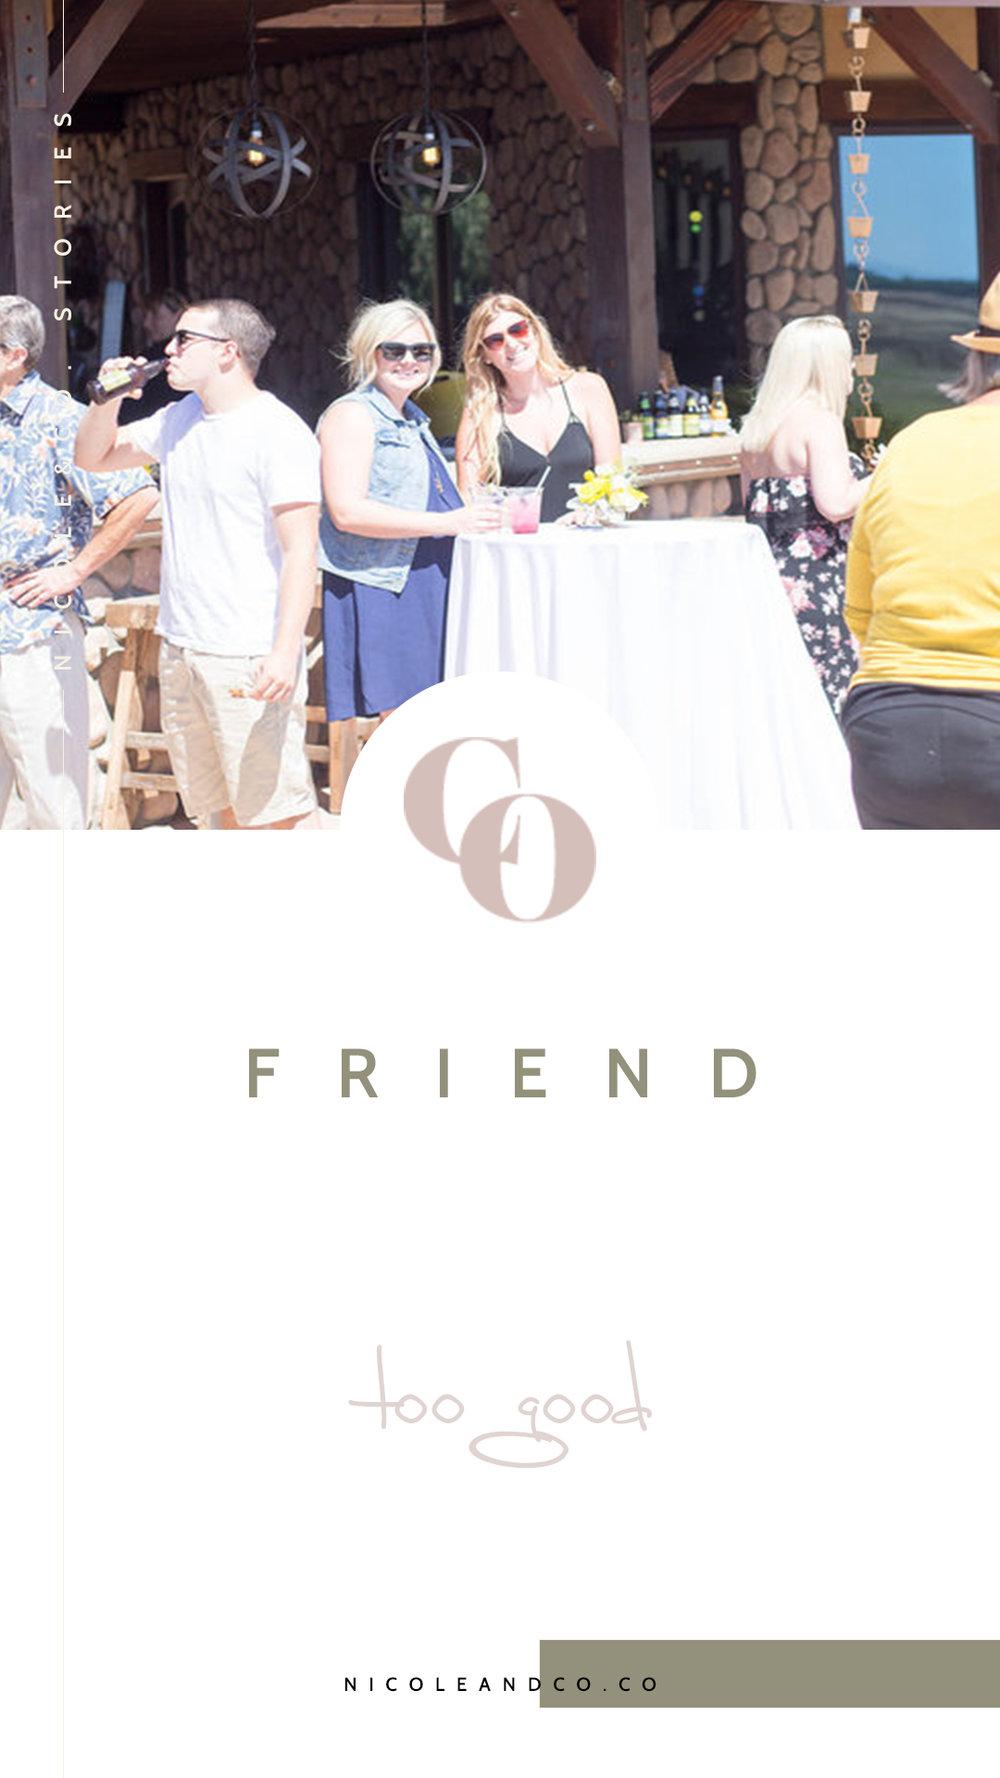 friendtoogood.jpg